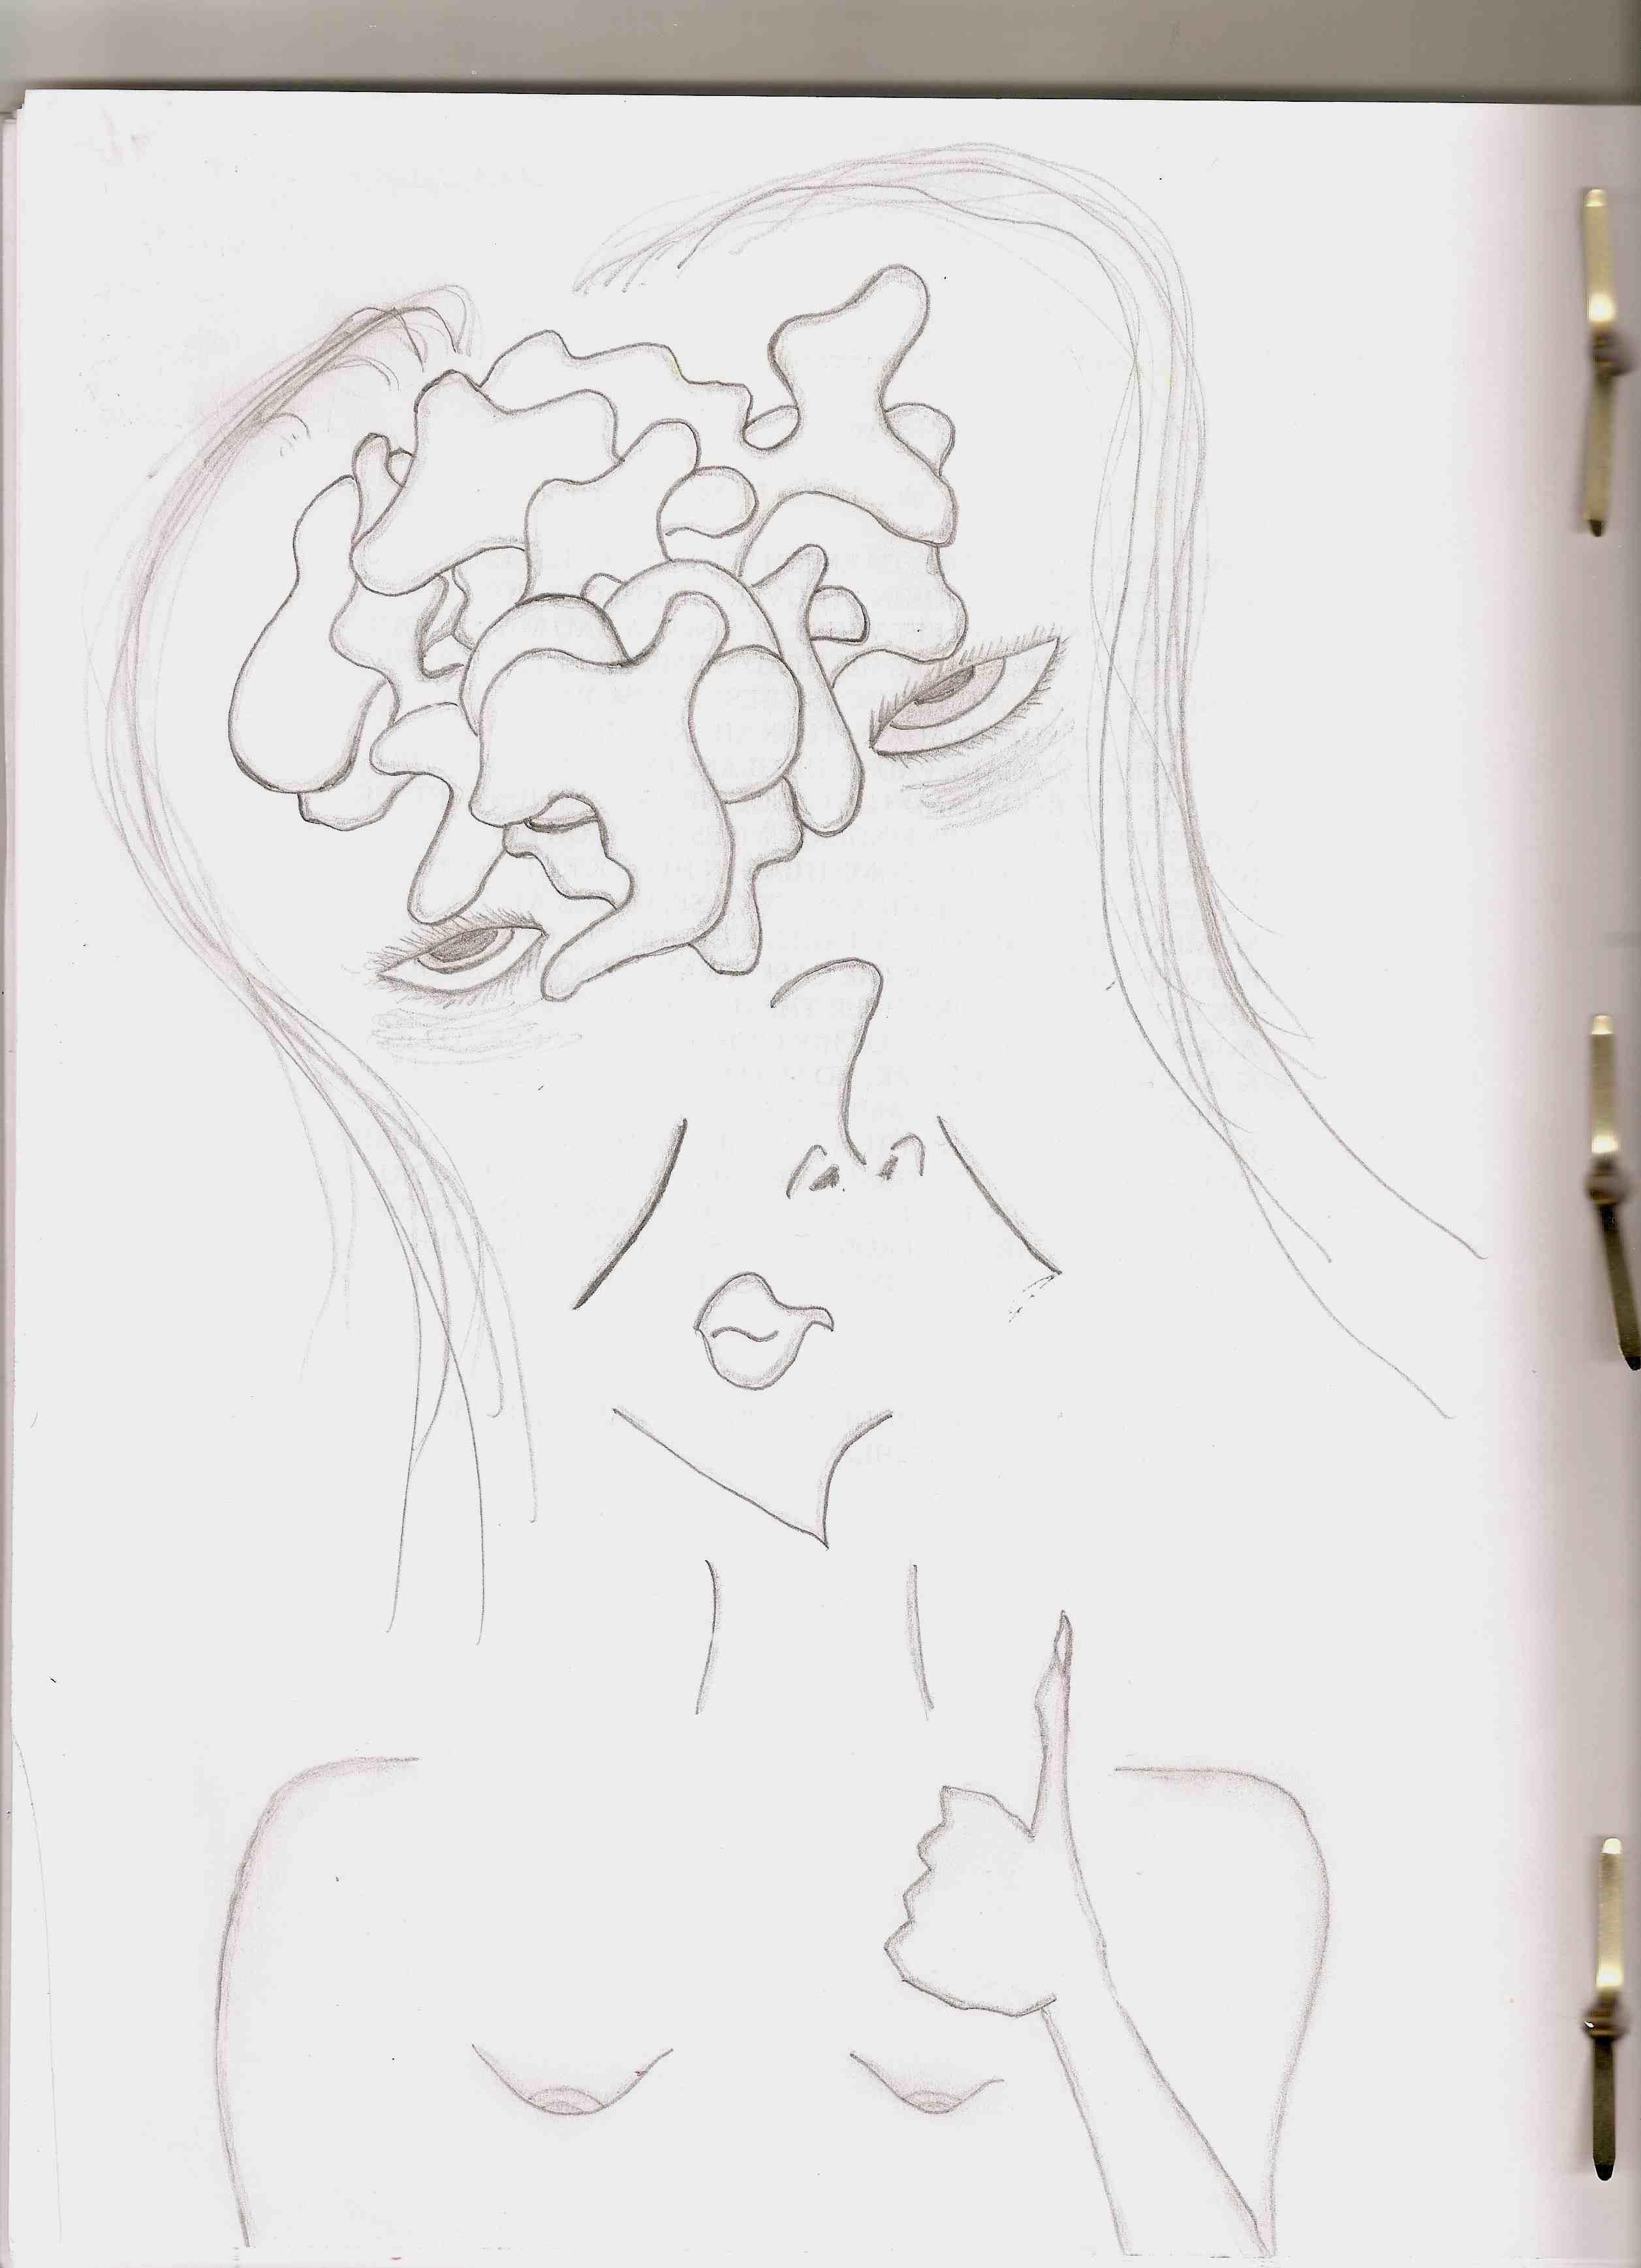 Blowjob drawing